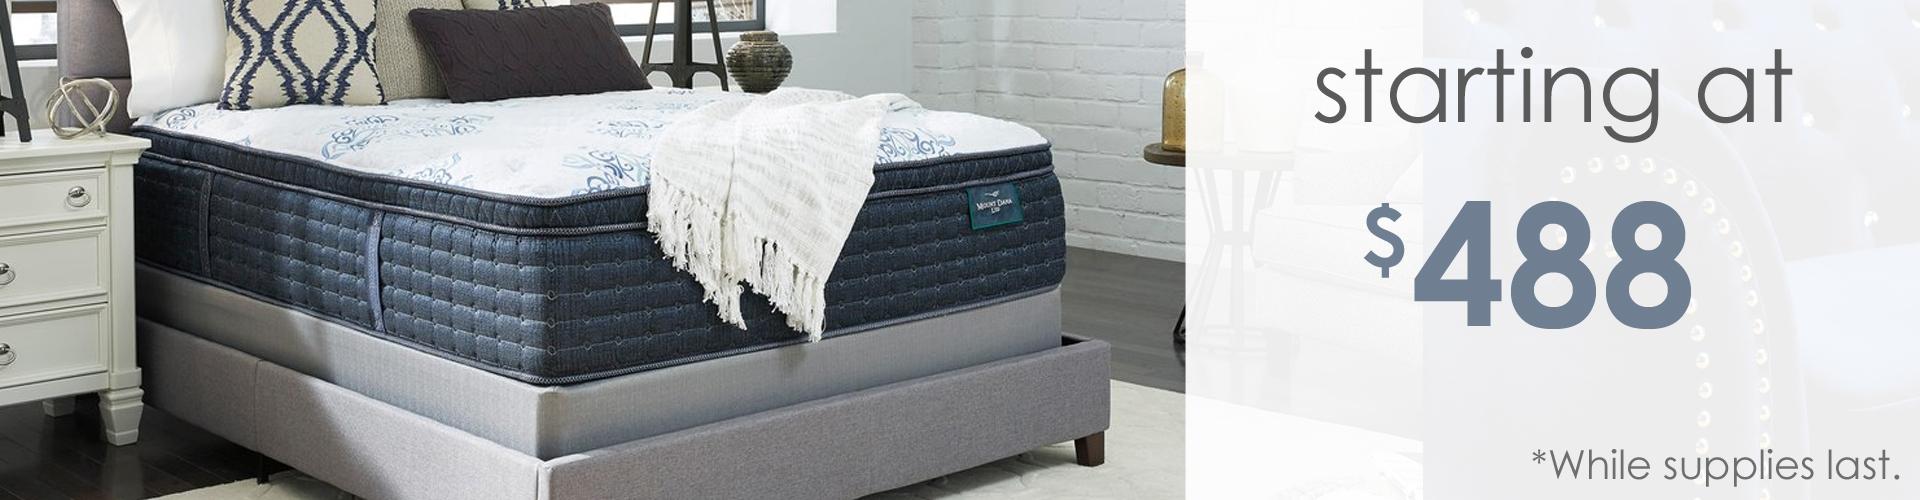 CBFurn.com | Home Store for Furniture, Matrress, Decor & More | CB on home and more, furniture and more, shoes and more,